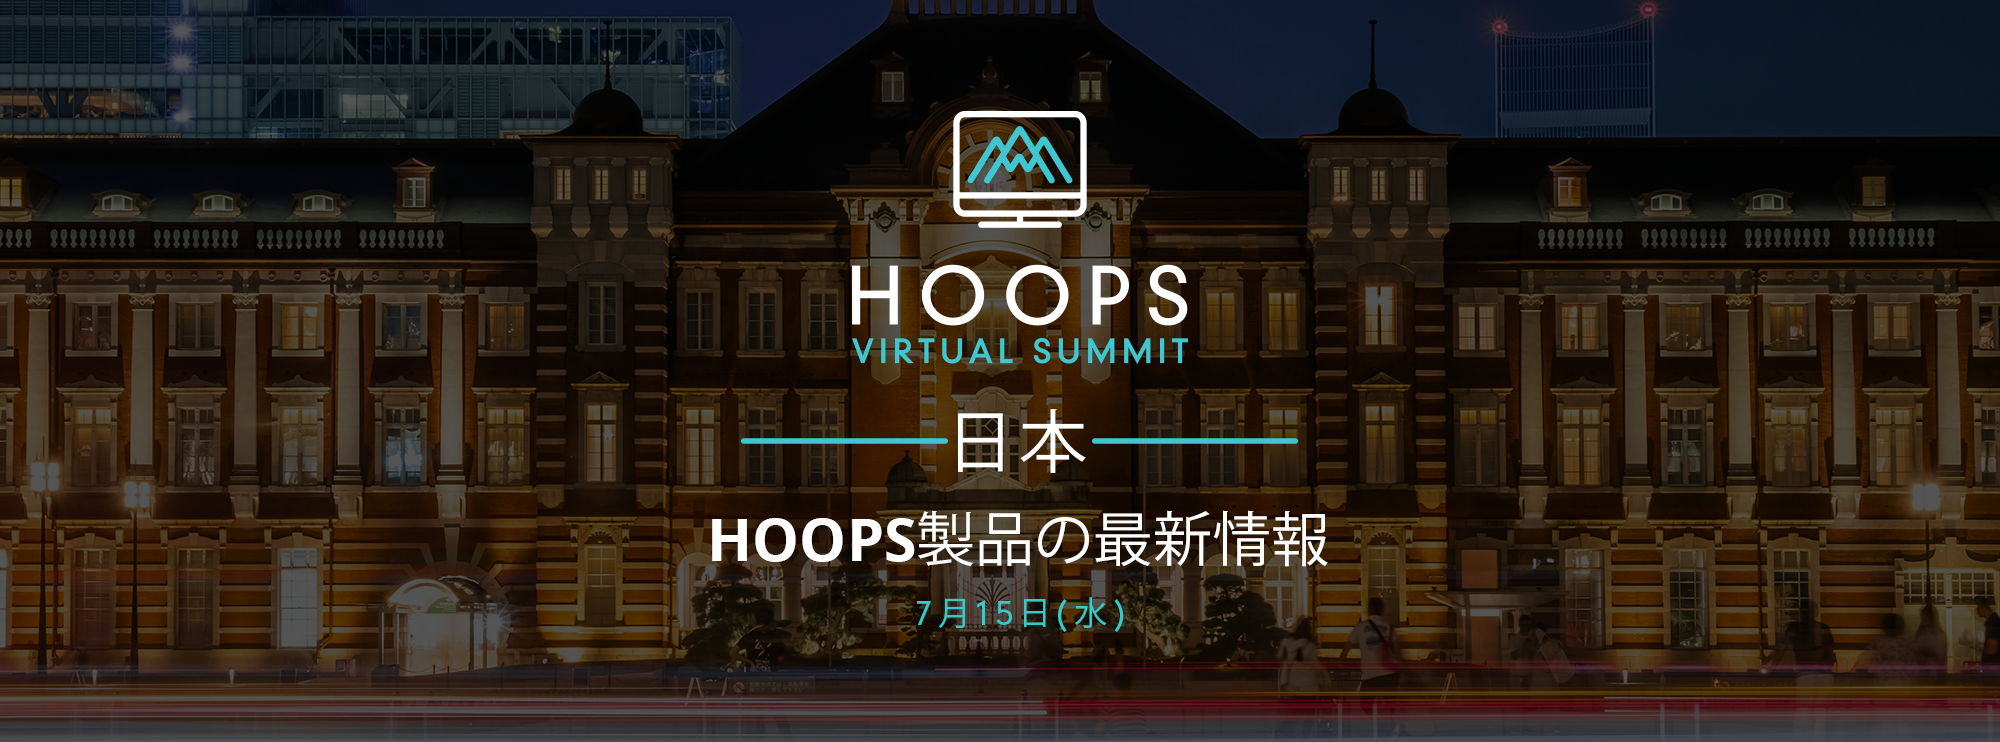 mailedit_HOOPS-Summit-Product_Japan-v3